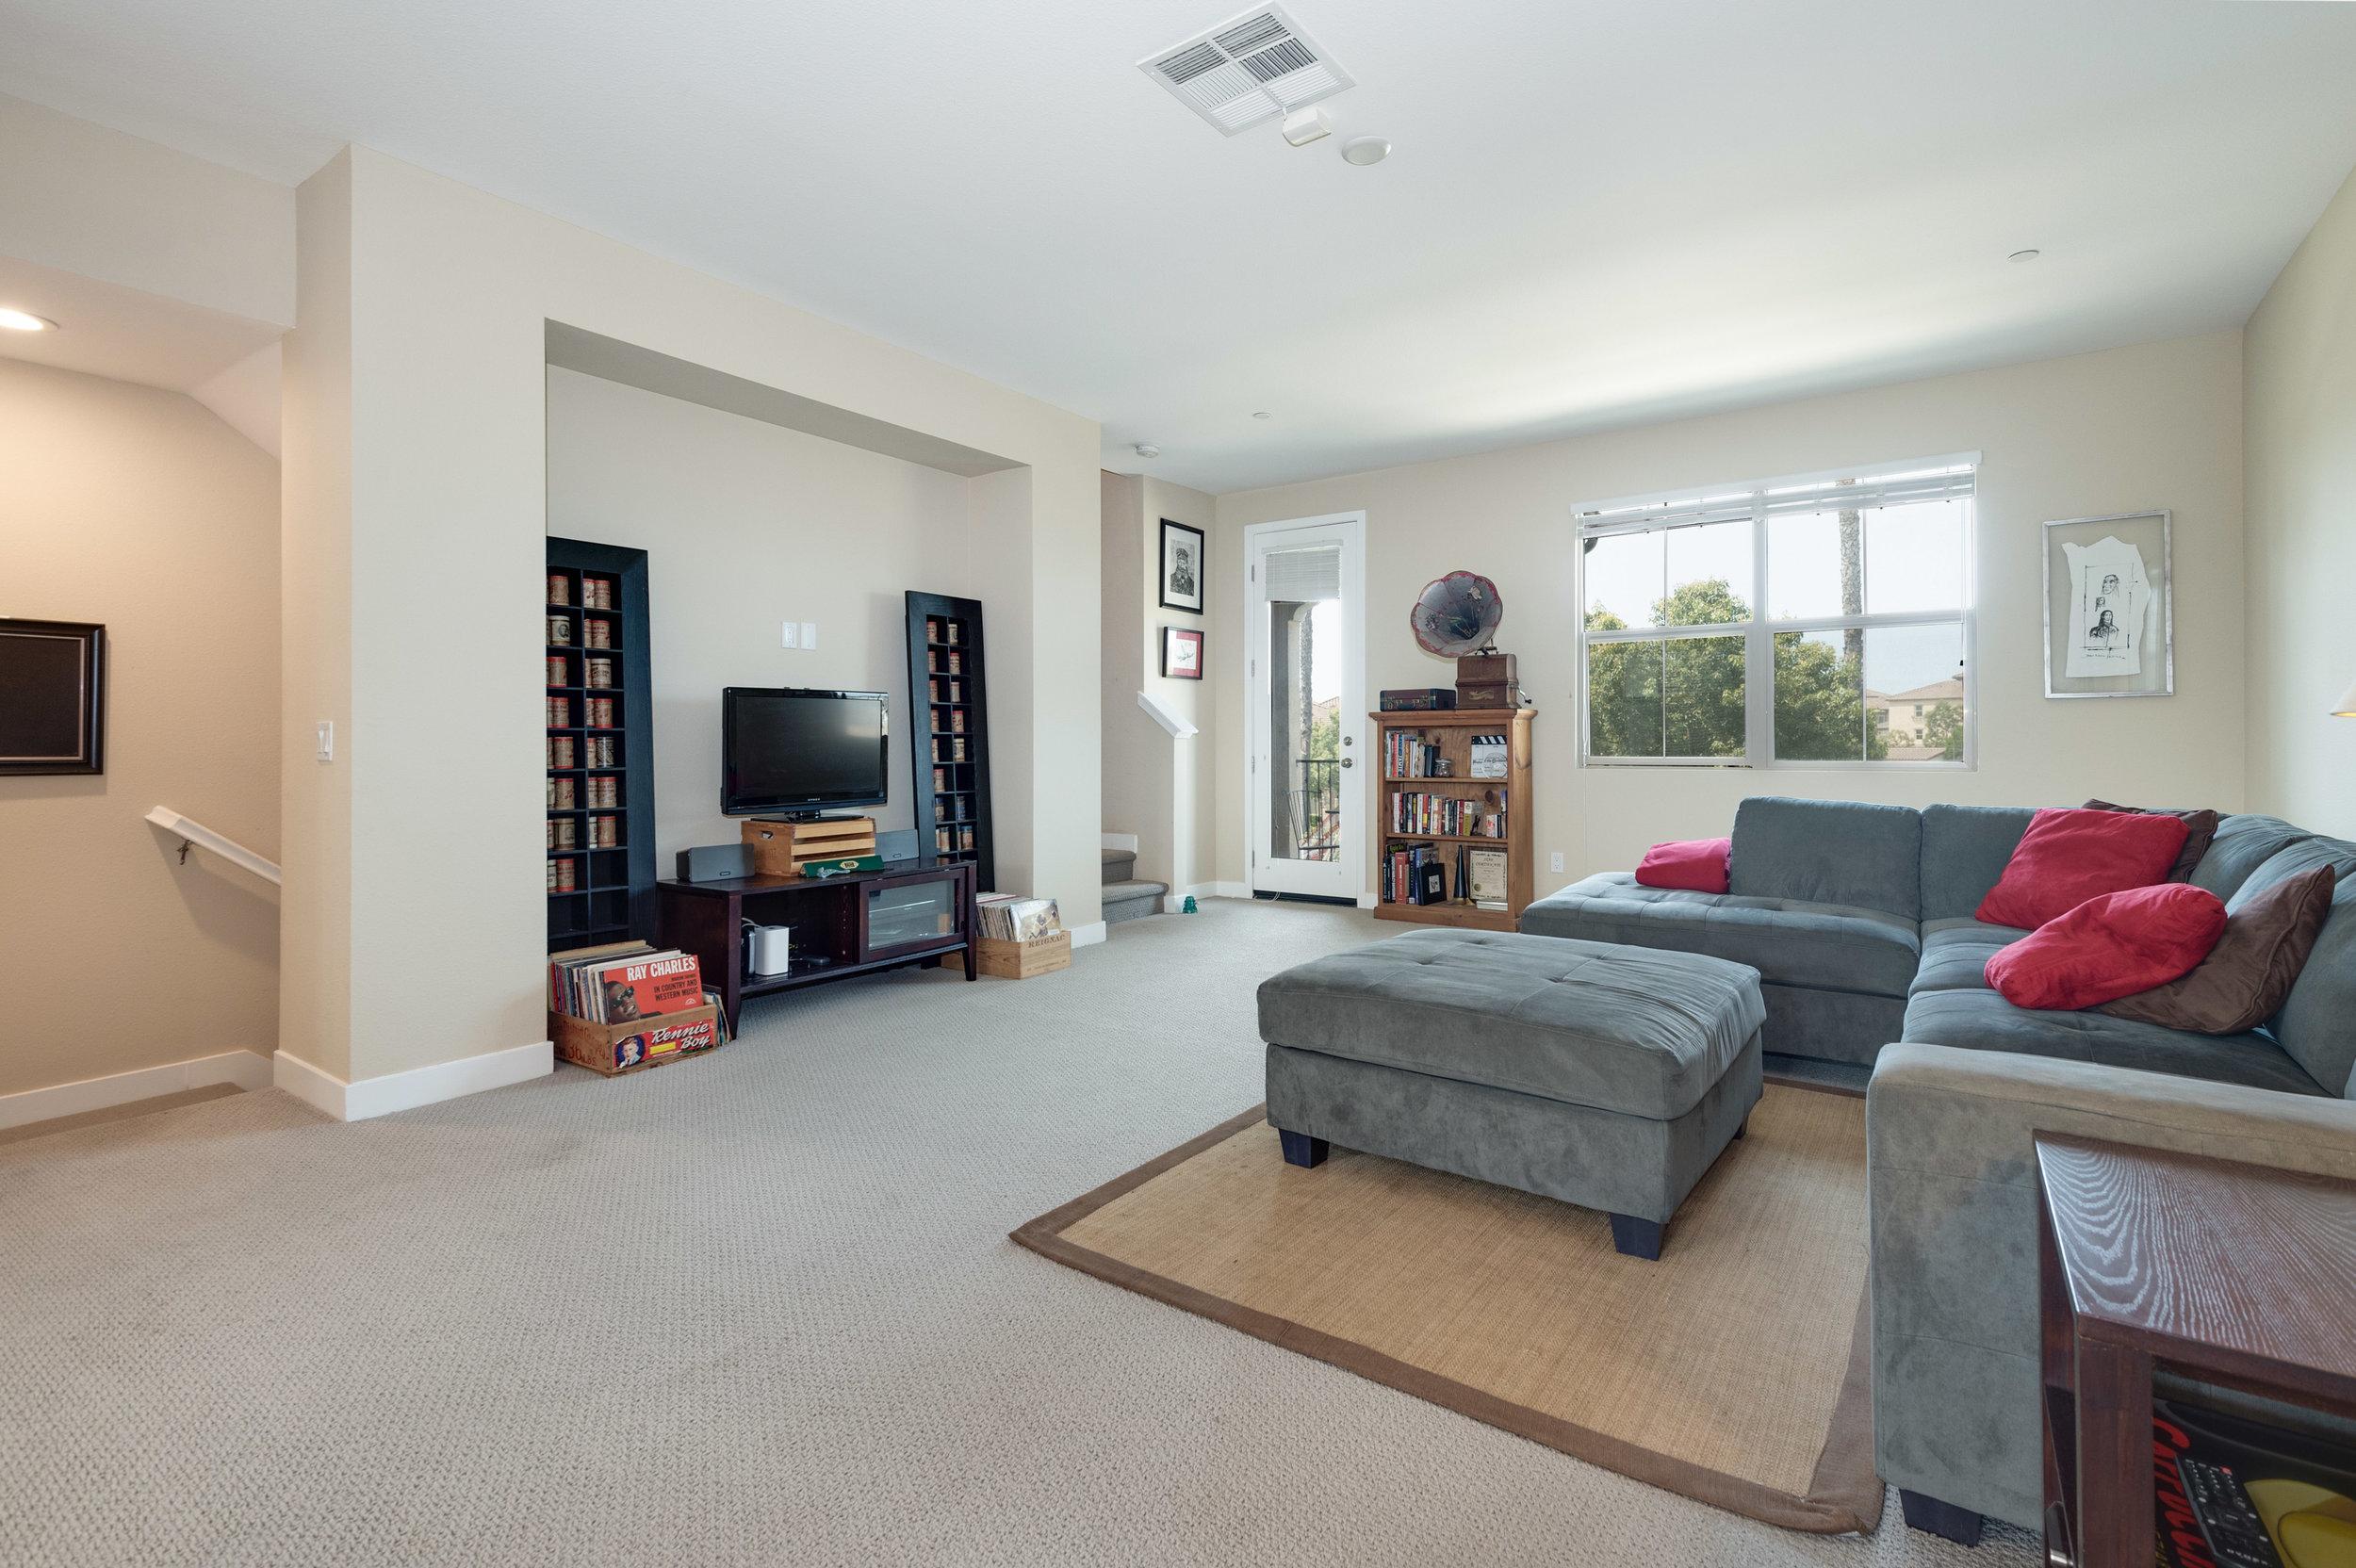 008 Living Room 207 Westpark Court Unit 702 Camarillo Bally Khehra For Sale Lease The Malibu Life Team Luxury Real Estate.jpg